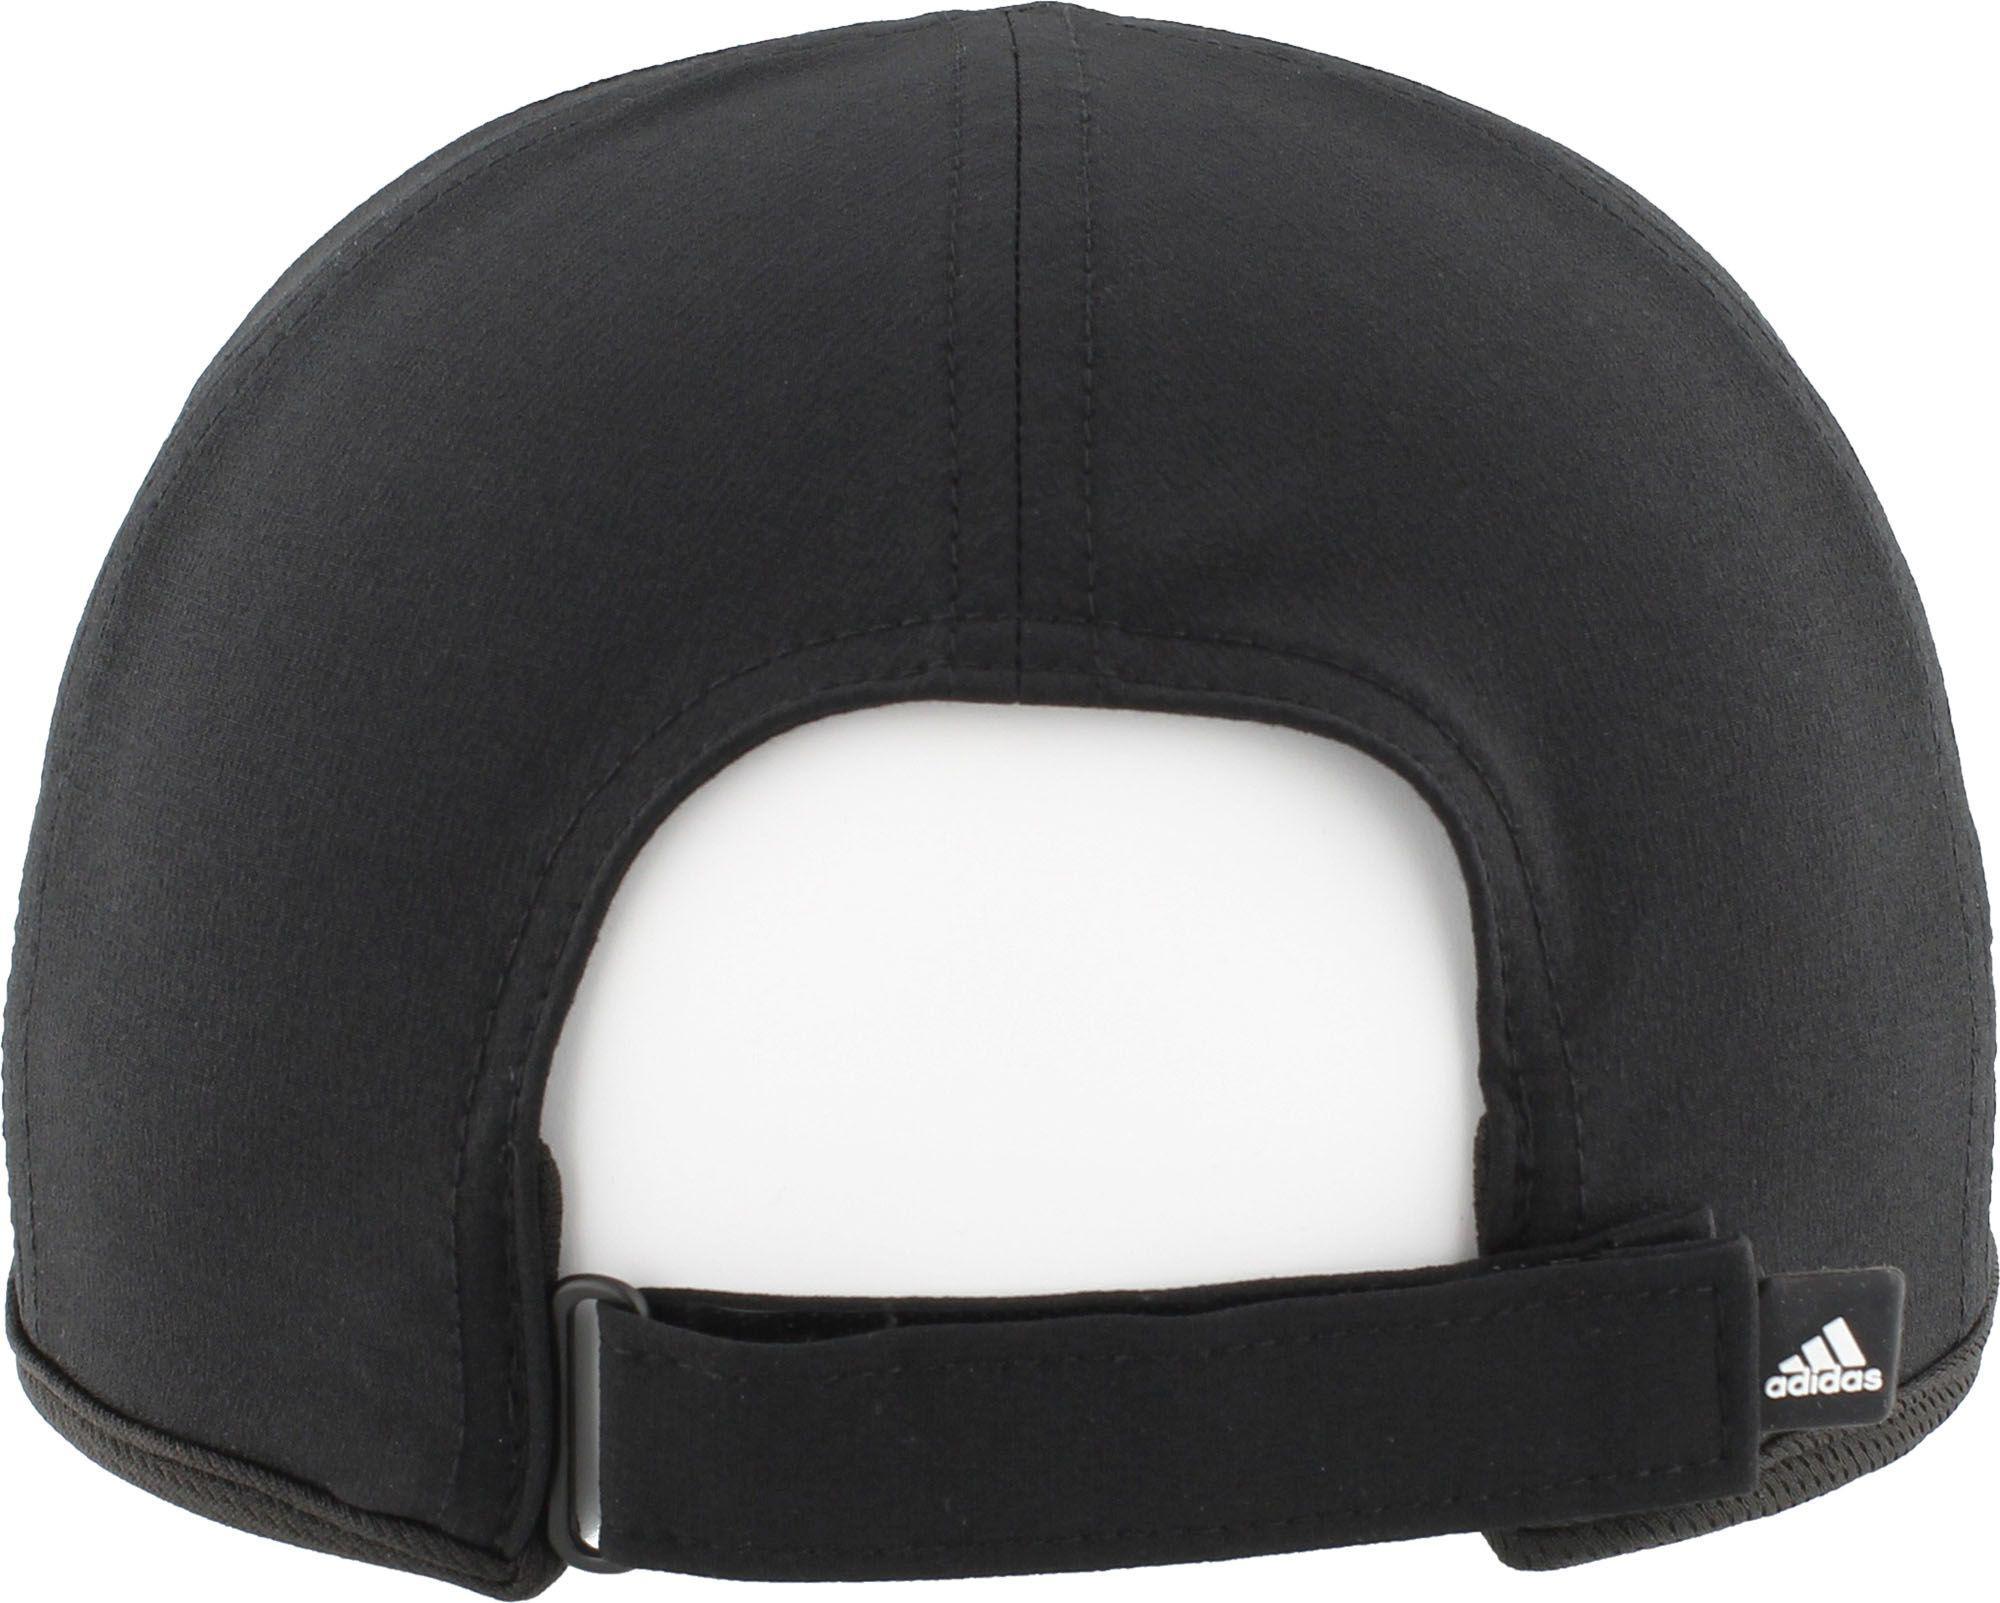 bc124d1e7fa81 Adidas - Black Superlite Hat for Men - Lyst. View fullscreen